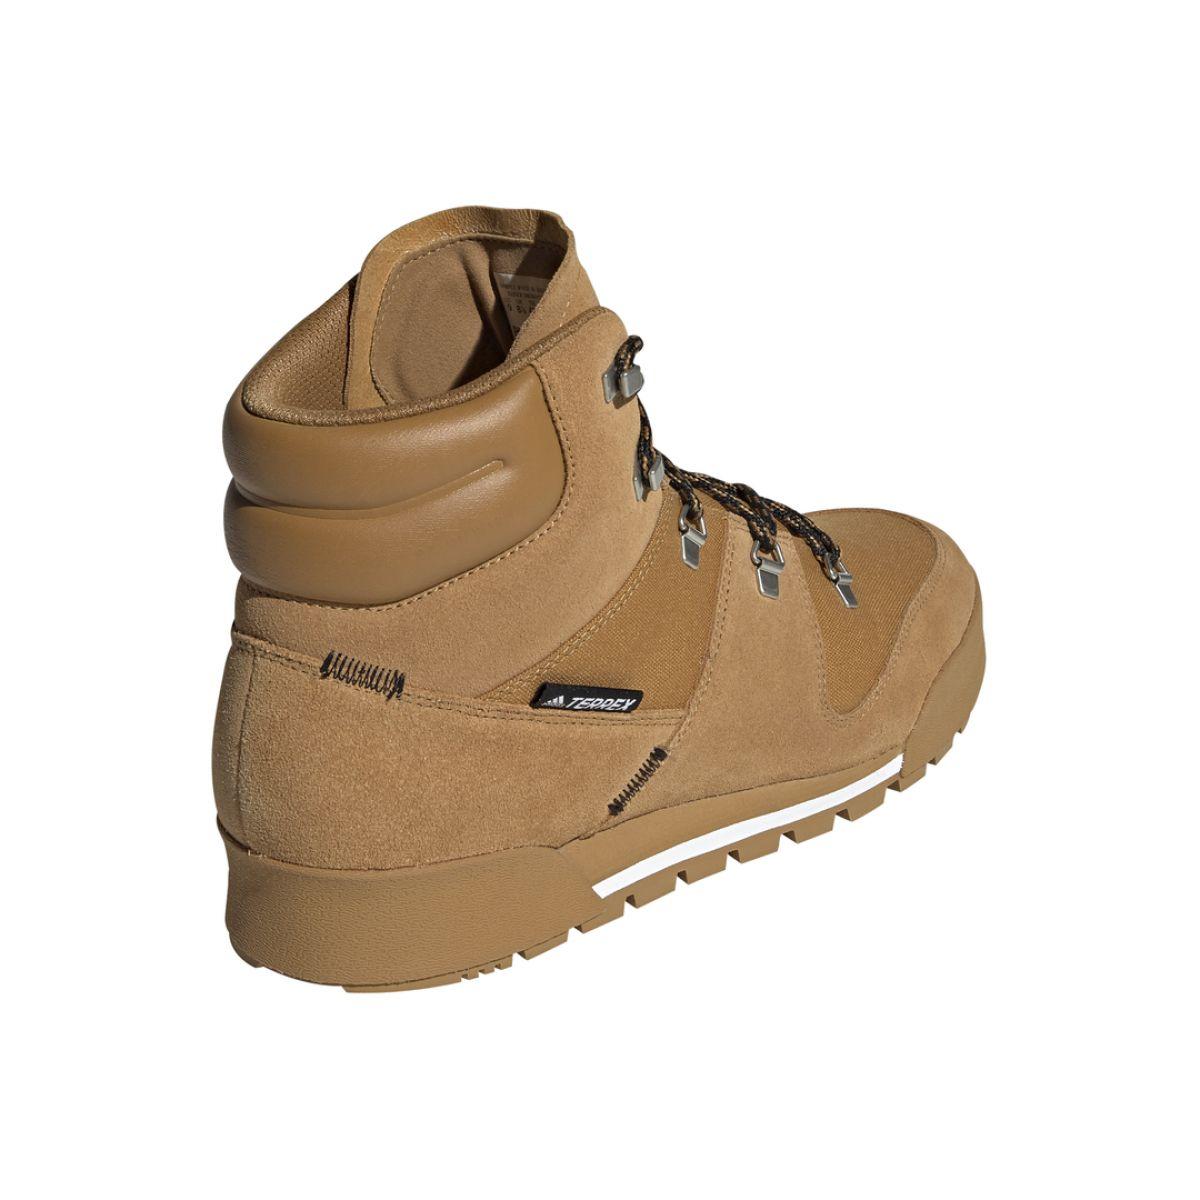 Buty adidas Terrex Snowpitch zimowe FV5353